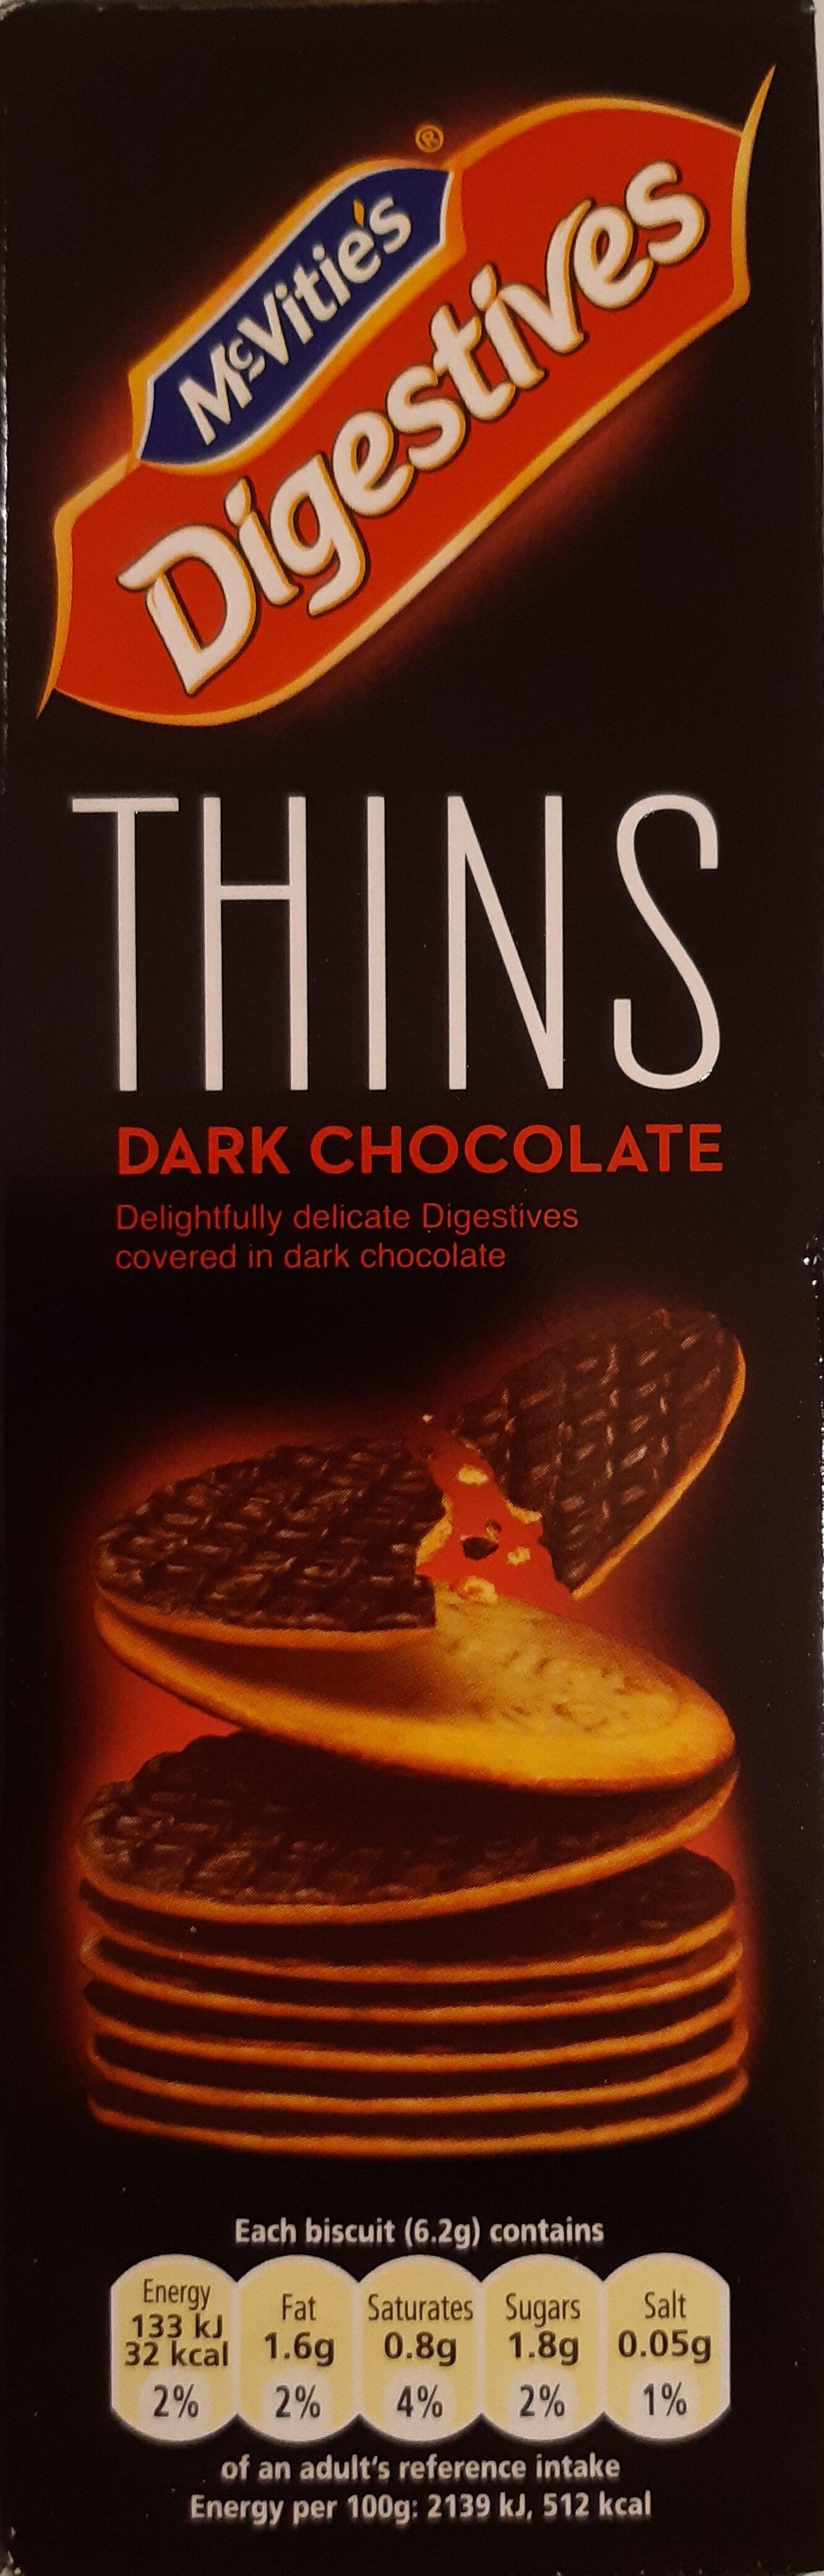 Mcvitie's Dark Chocolate Digestive Thins - Product - en